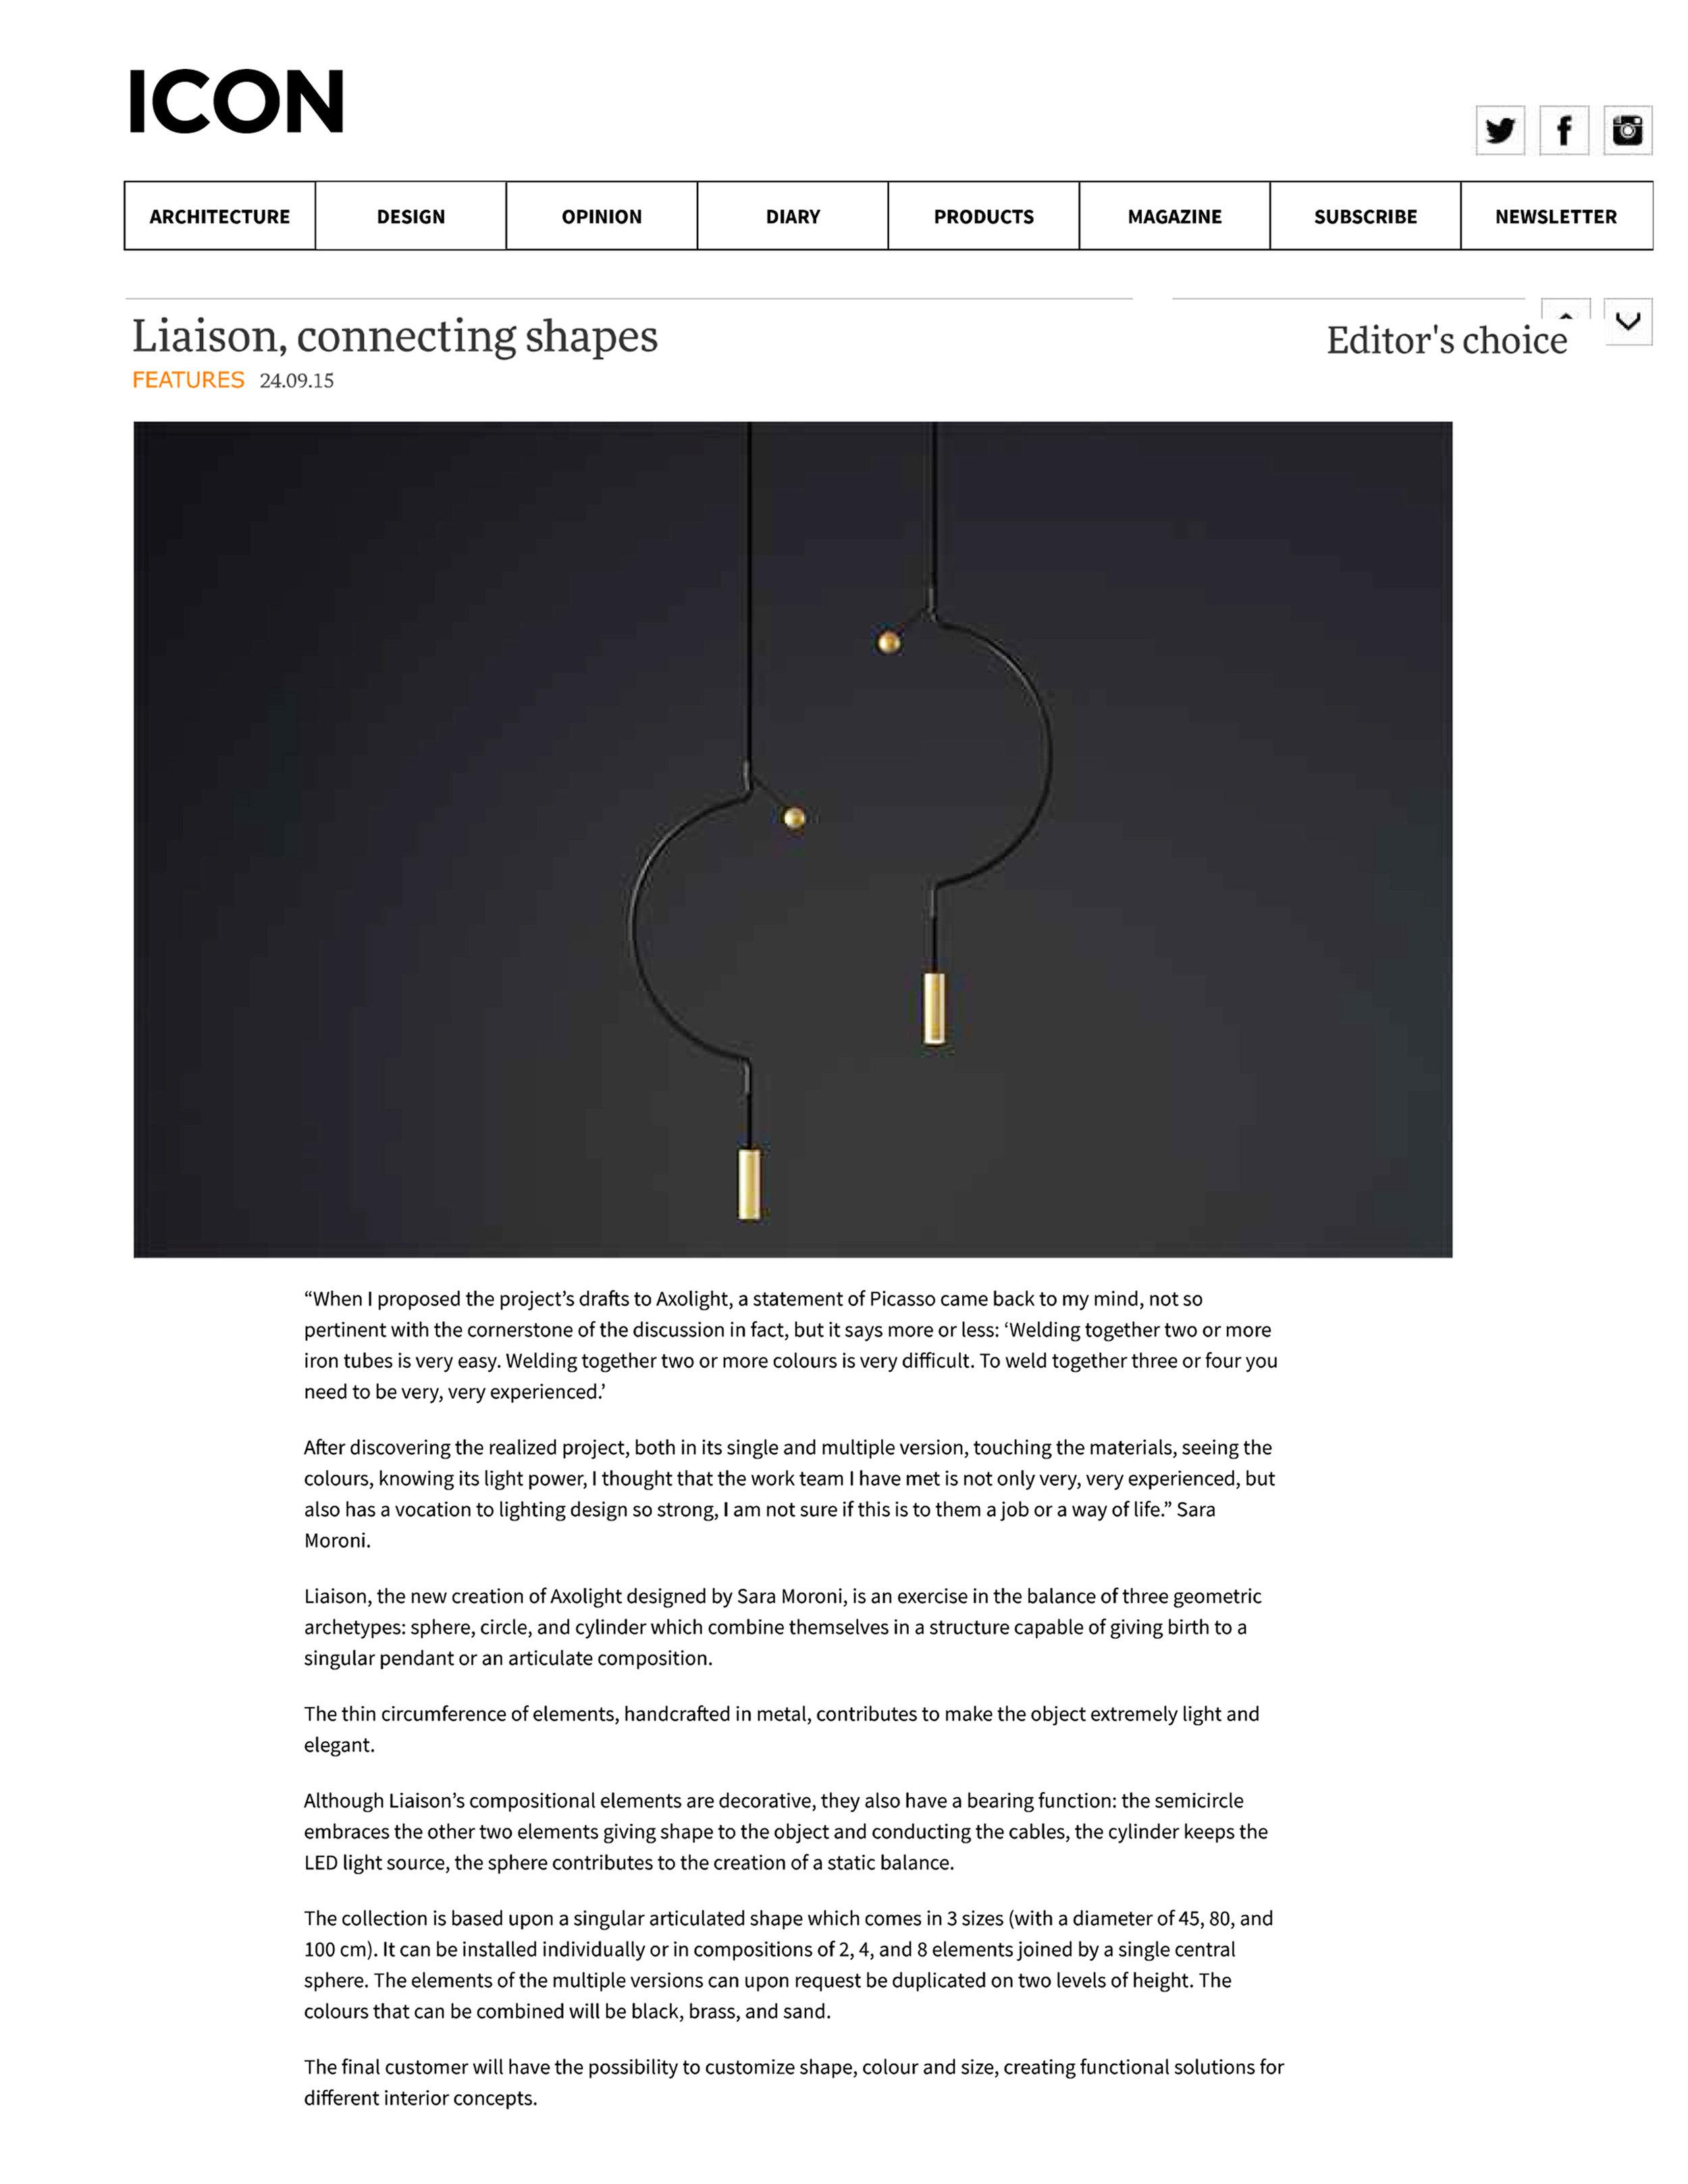 Iconeye   Liaison, connecting shapes